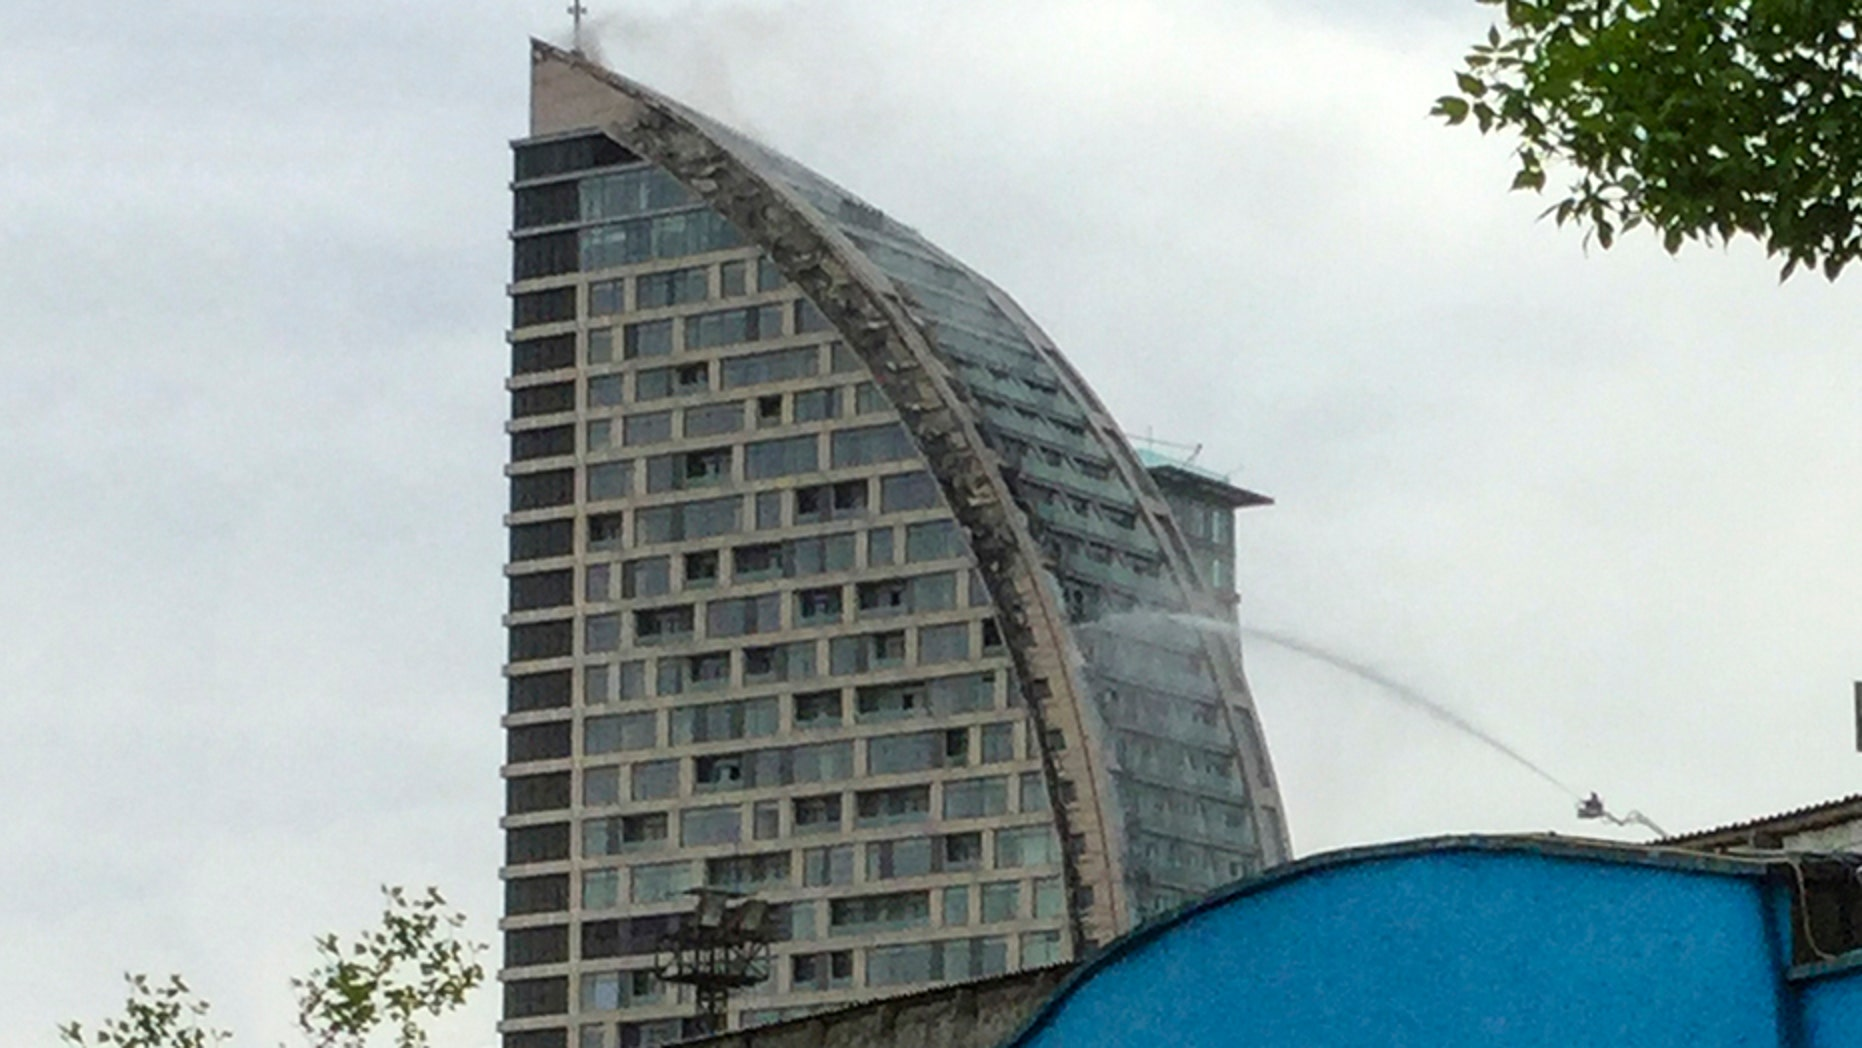 Azerbaijani firefighters work at the scene of the Trump-branded building in Baku, Azerbaijan, Saturday.